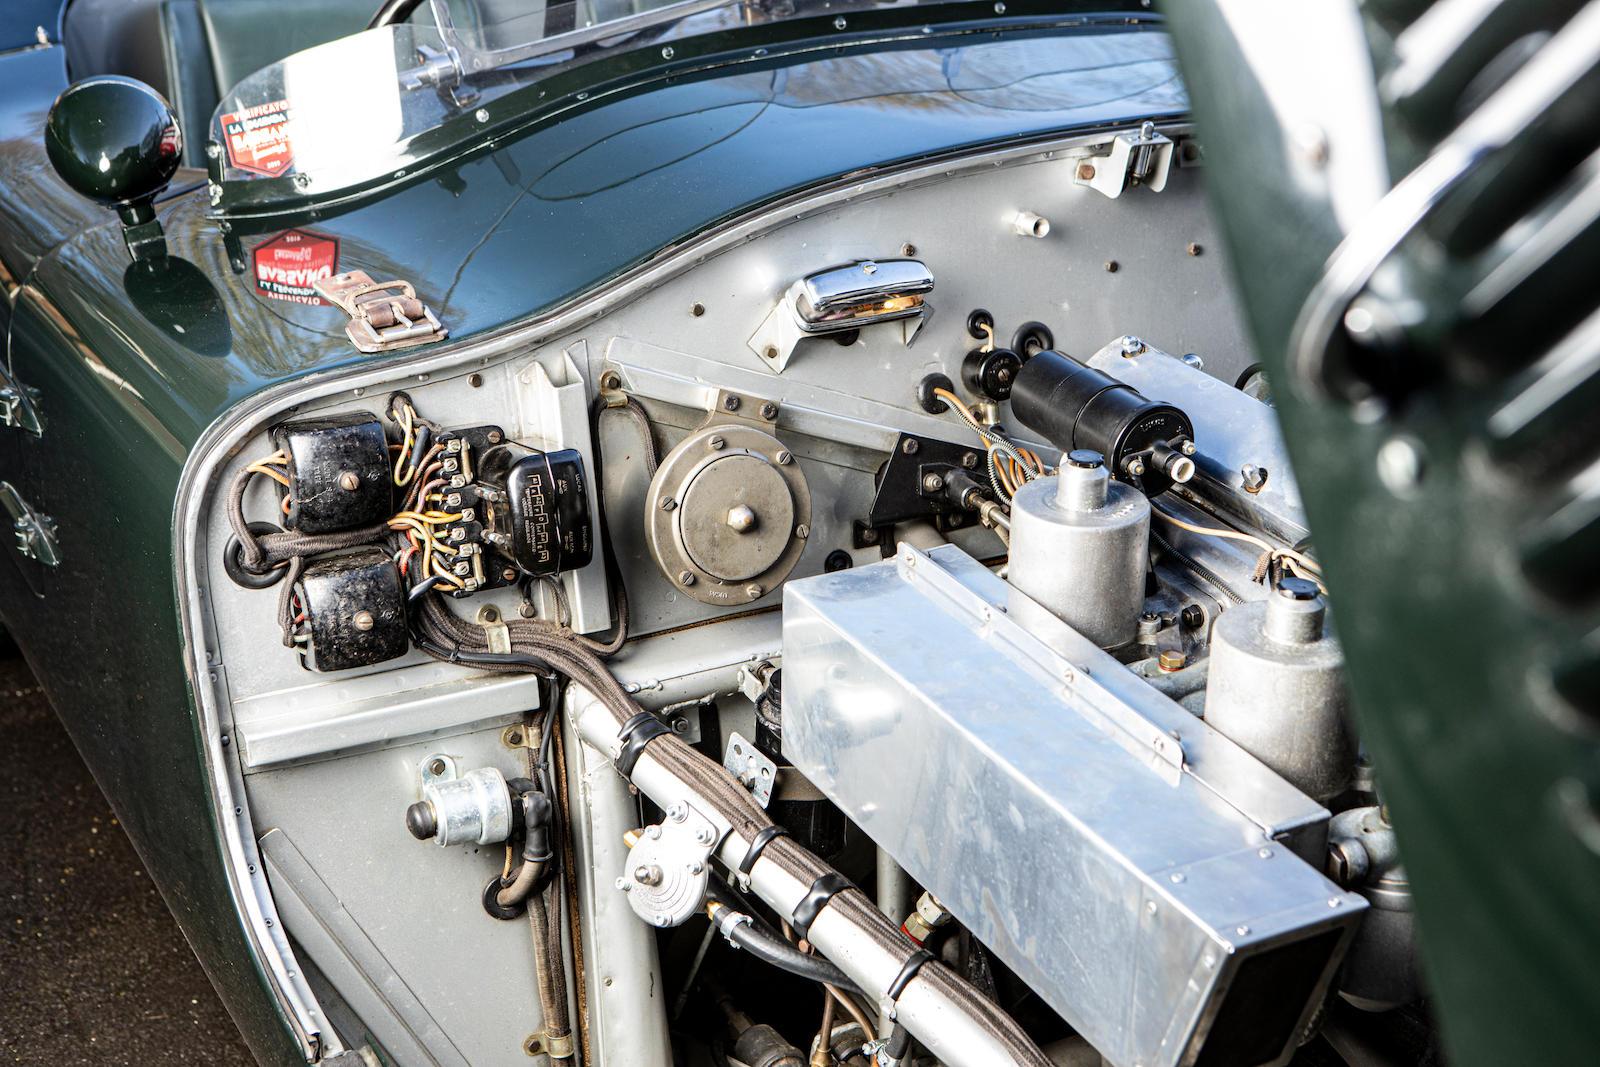 1952 Jaguar XK120 C-Type engine bay